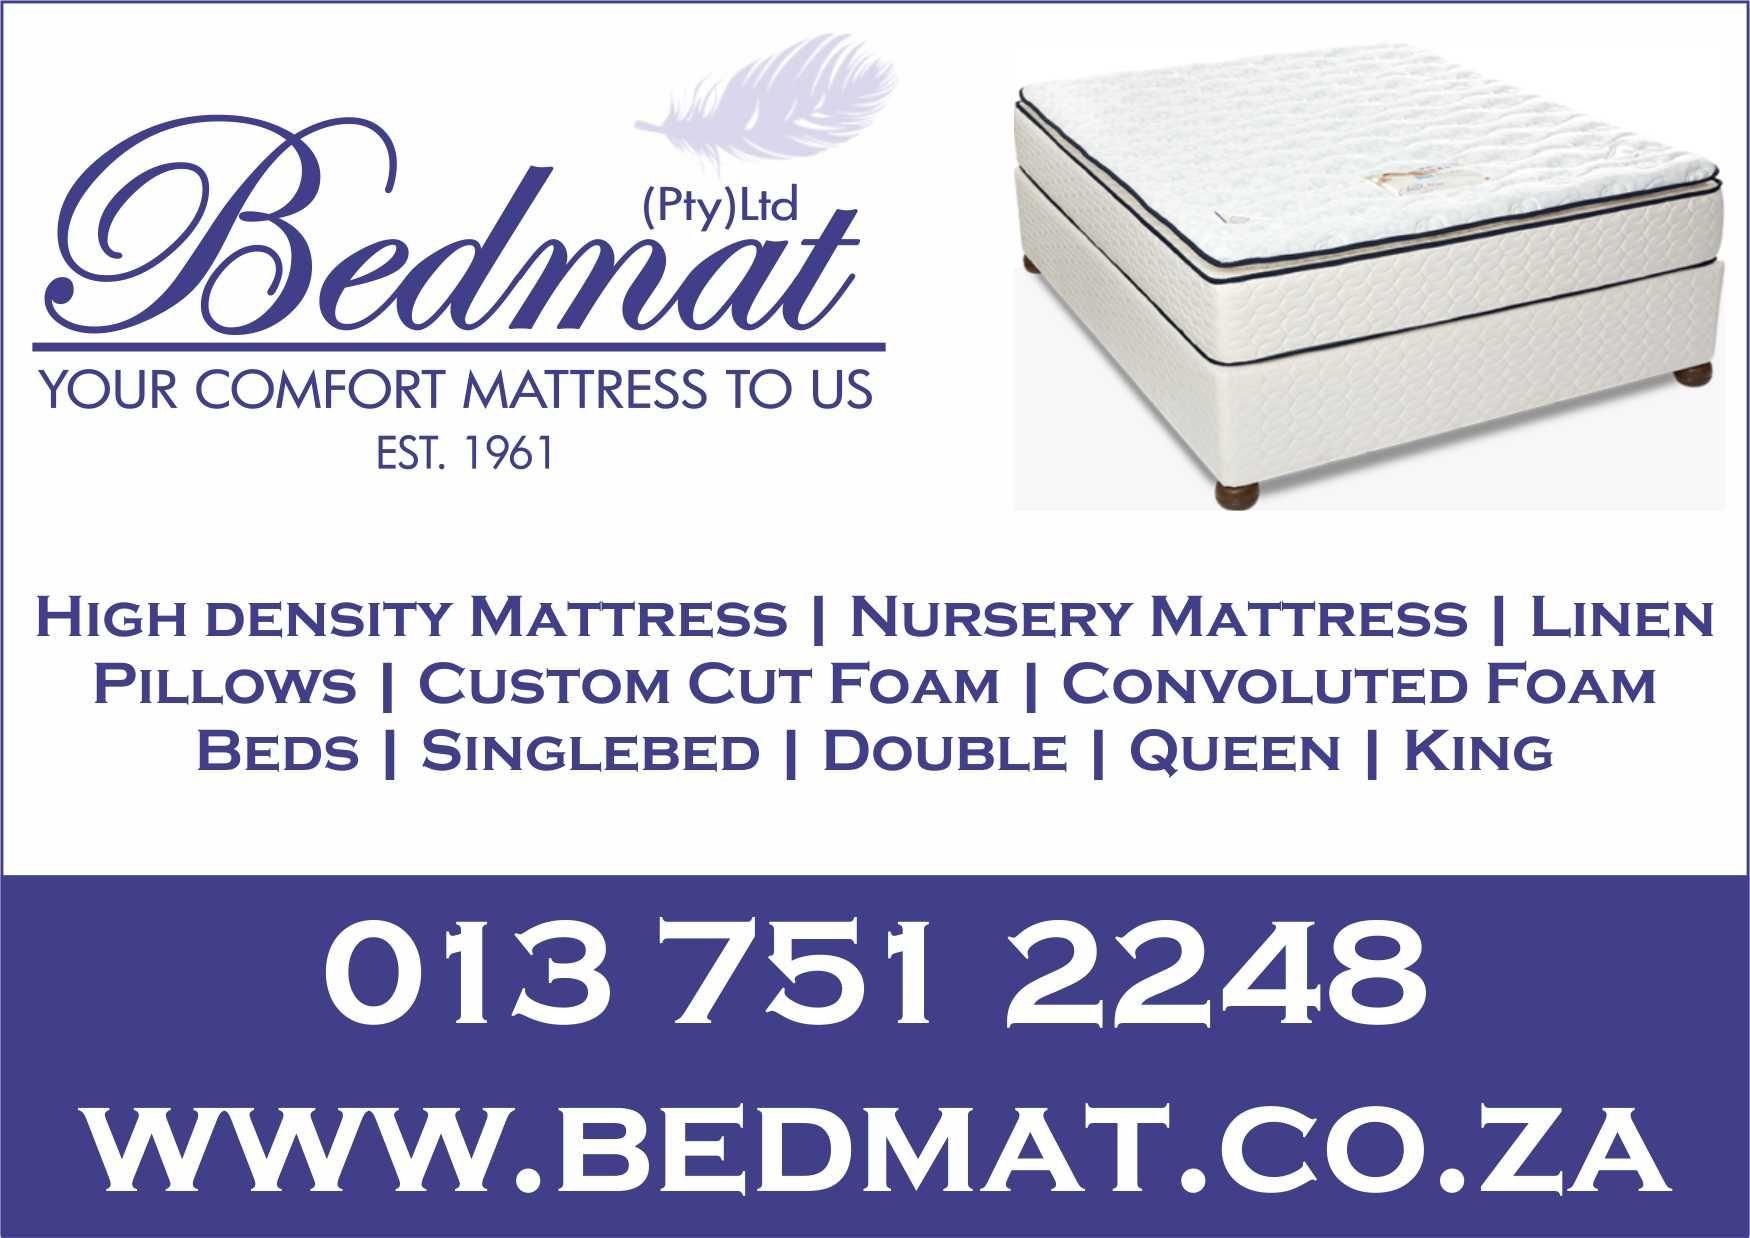 Beds Mattresses Beds For Sale Johannesburg South Africa Mattress Box Springs Bed Mattress Bed